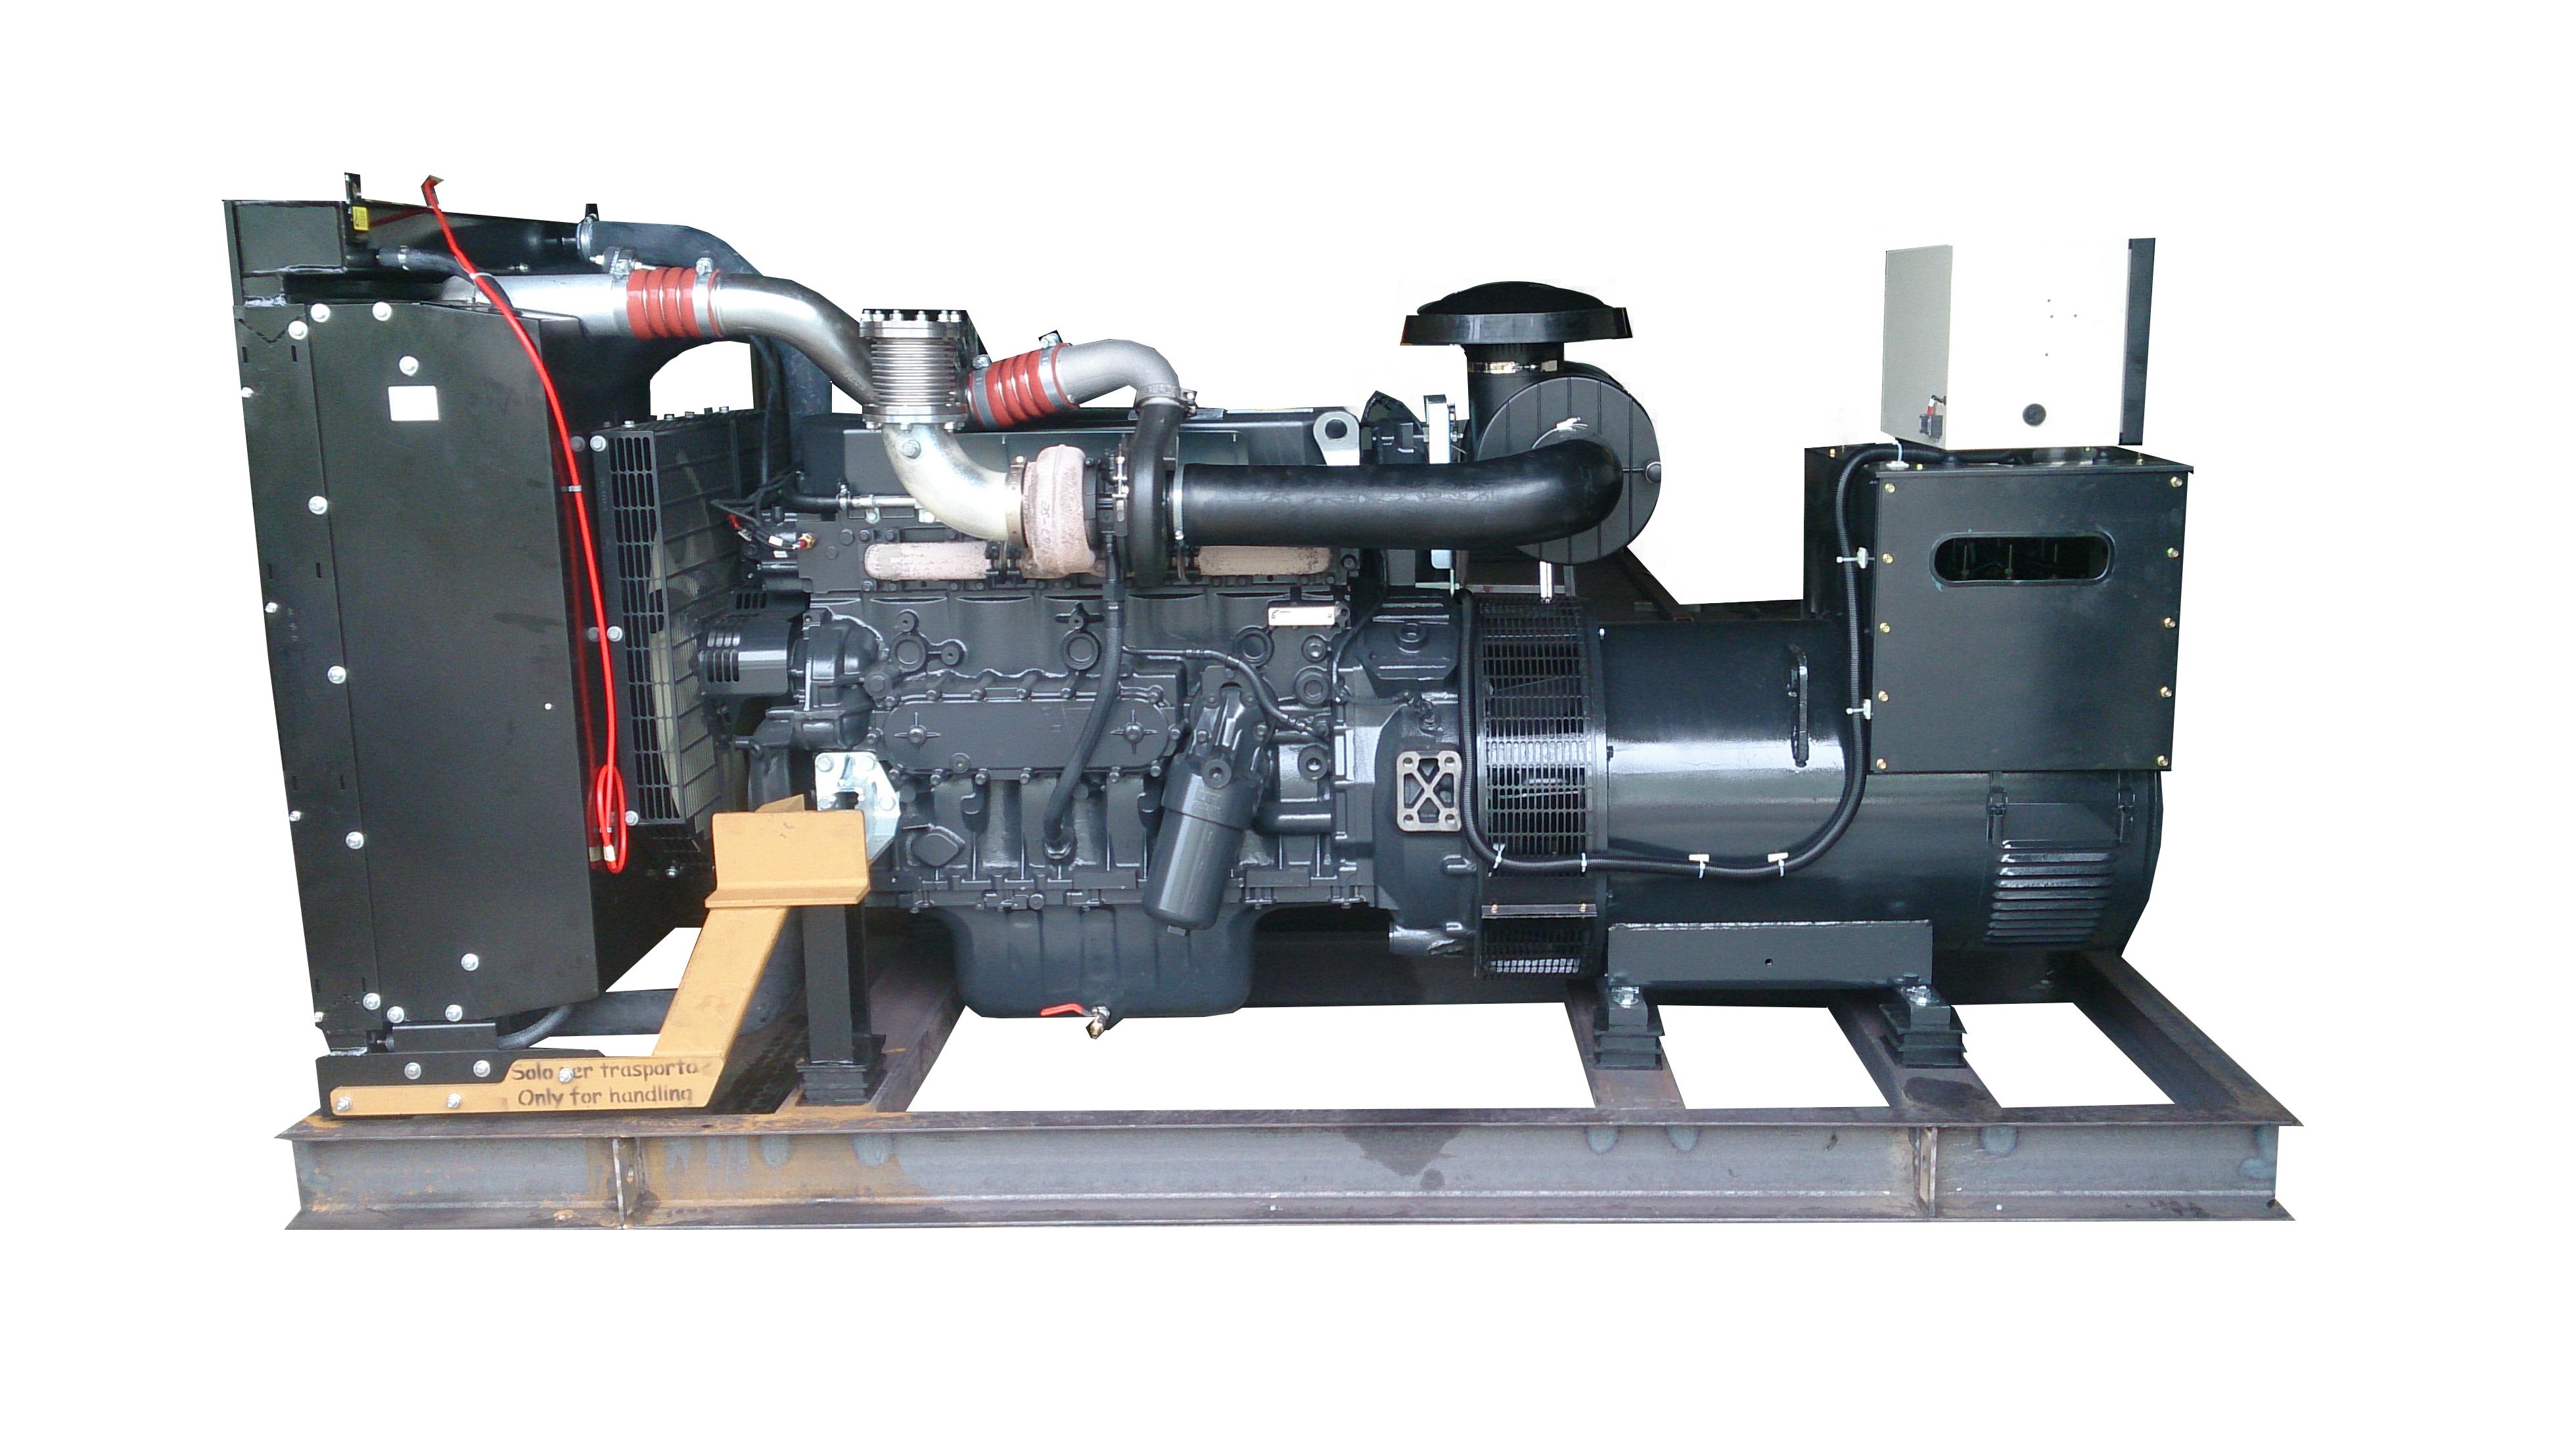 HI-250